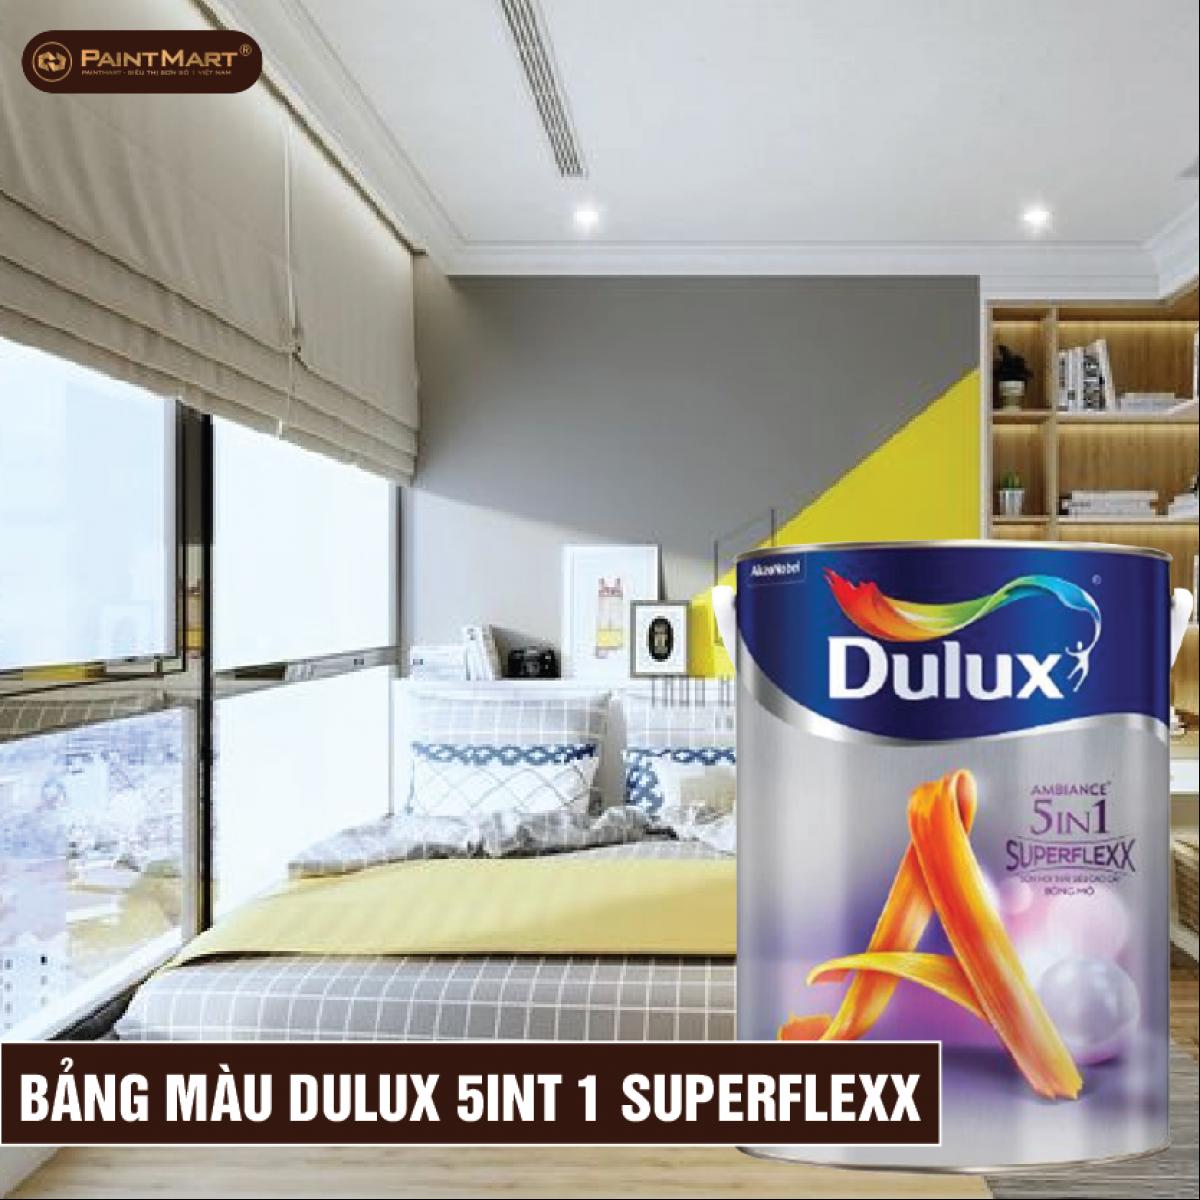 Bảng màu sơn Dulux 5 In 1 Superflexx